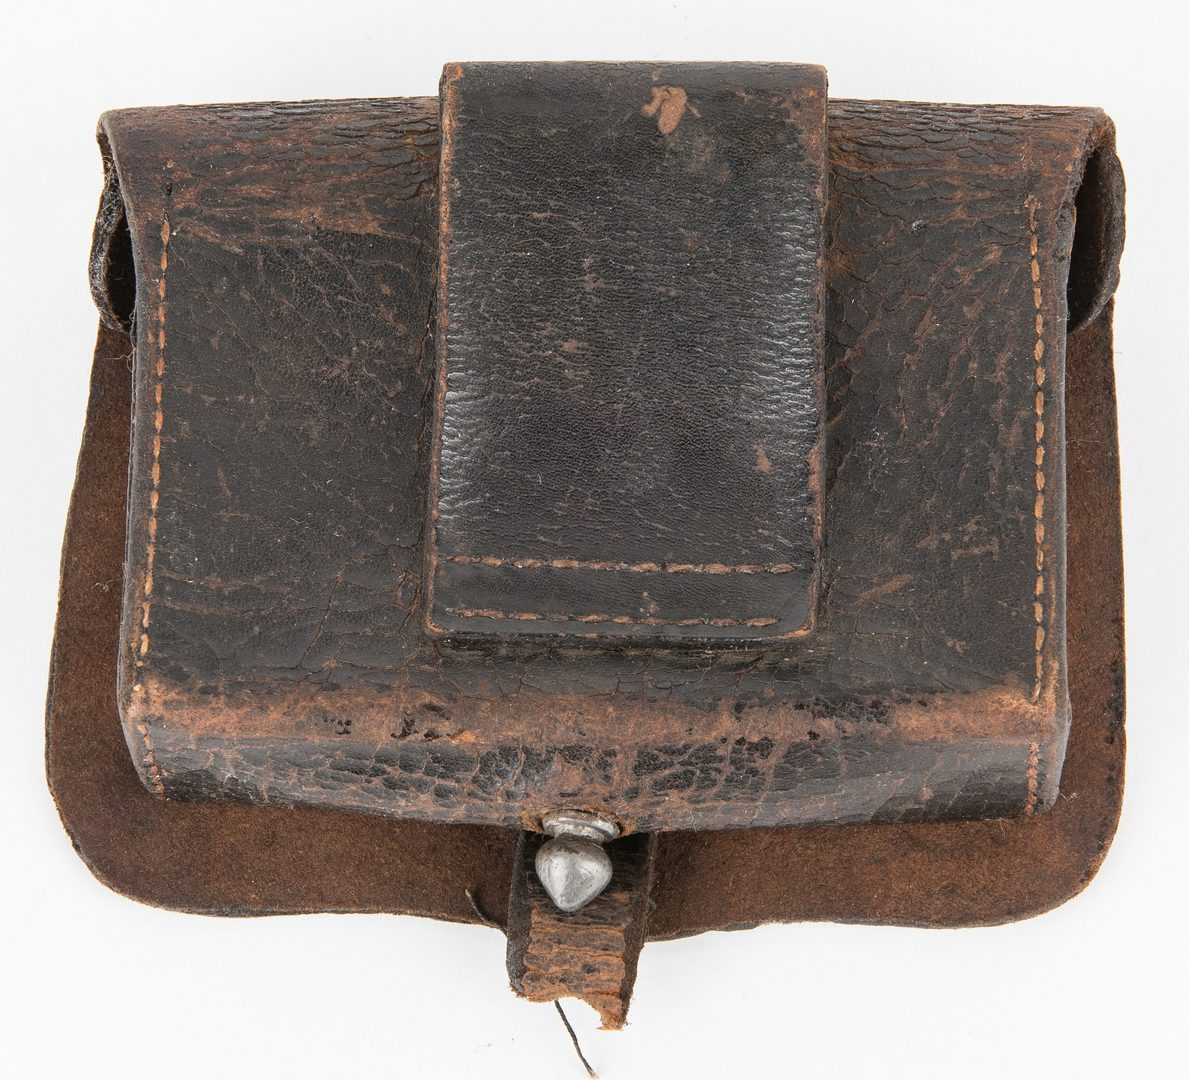 Lot 283: Confederate Identified Pistol Cartridge Box